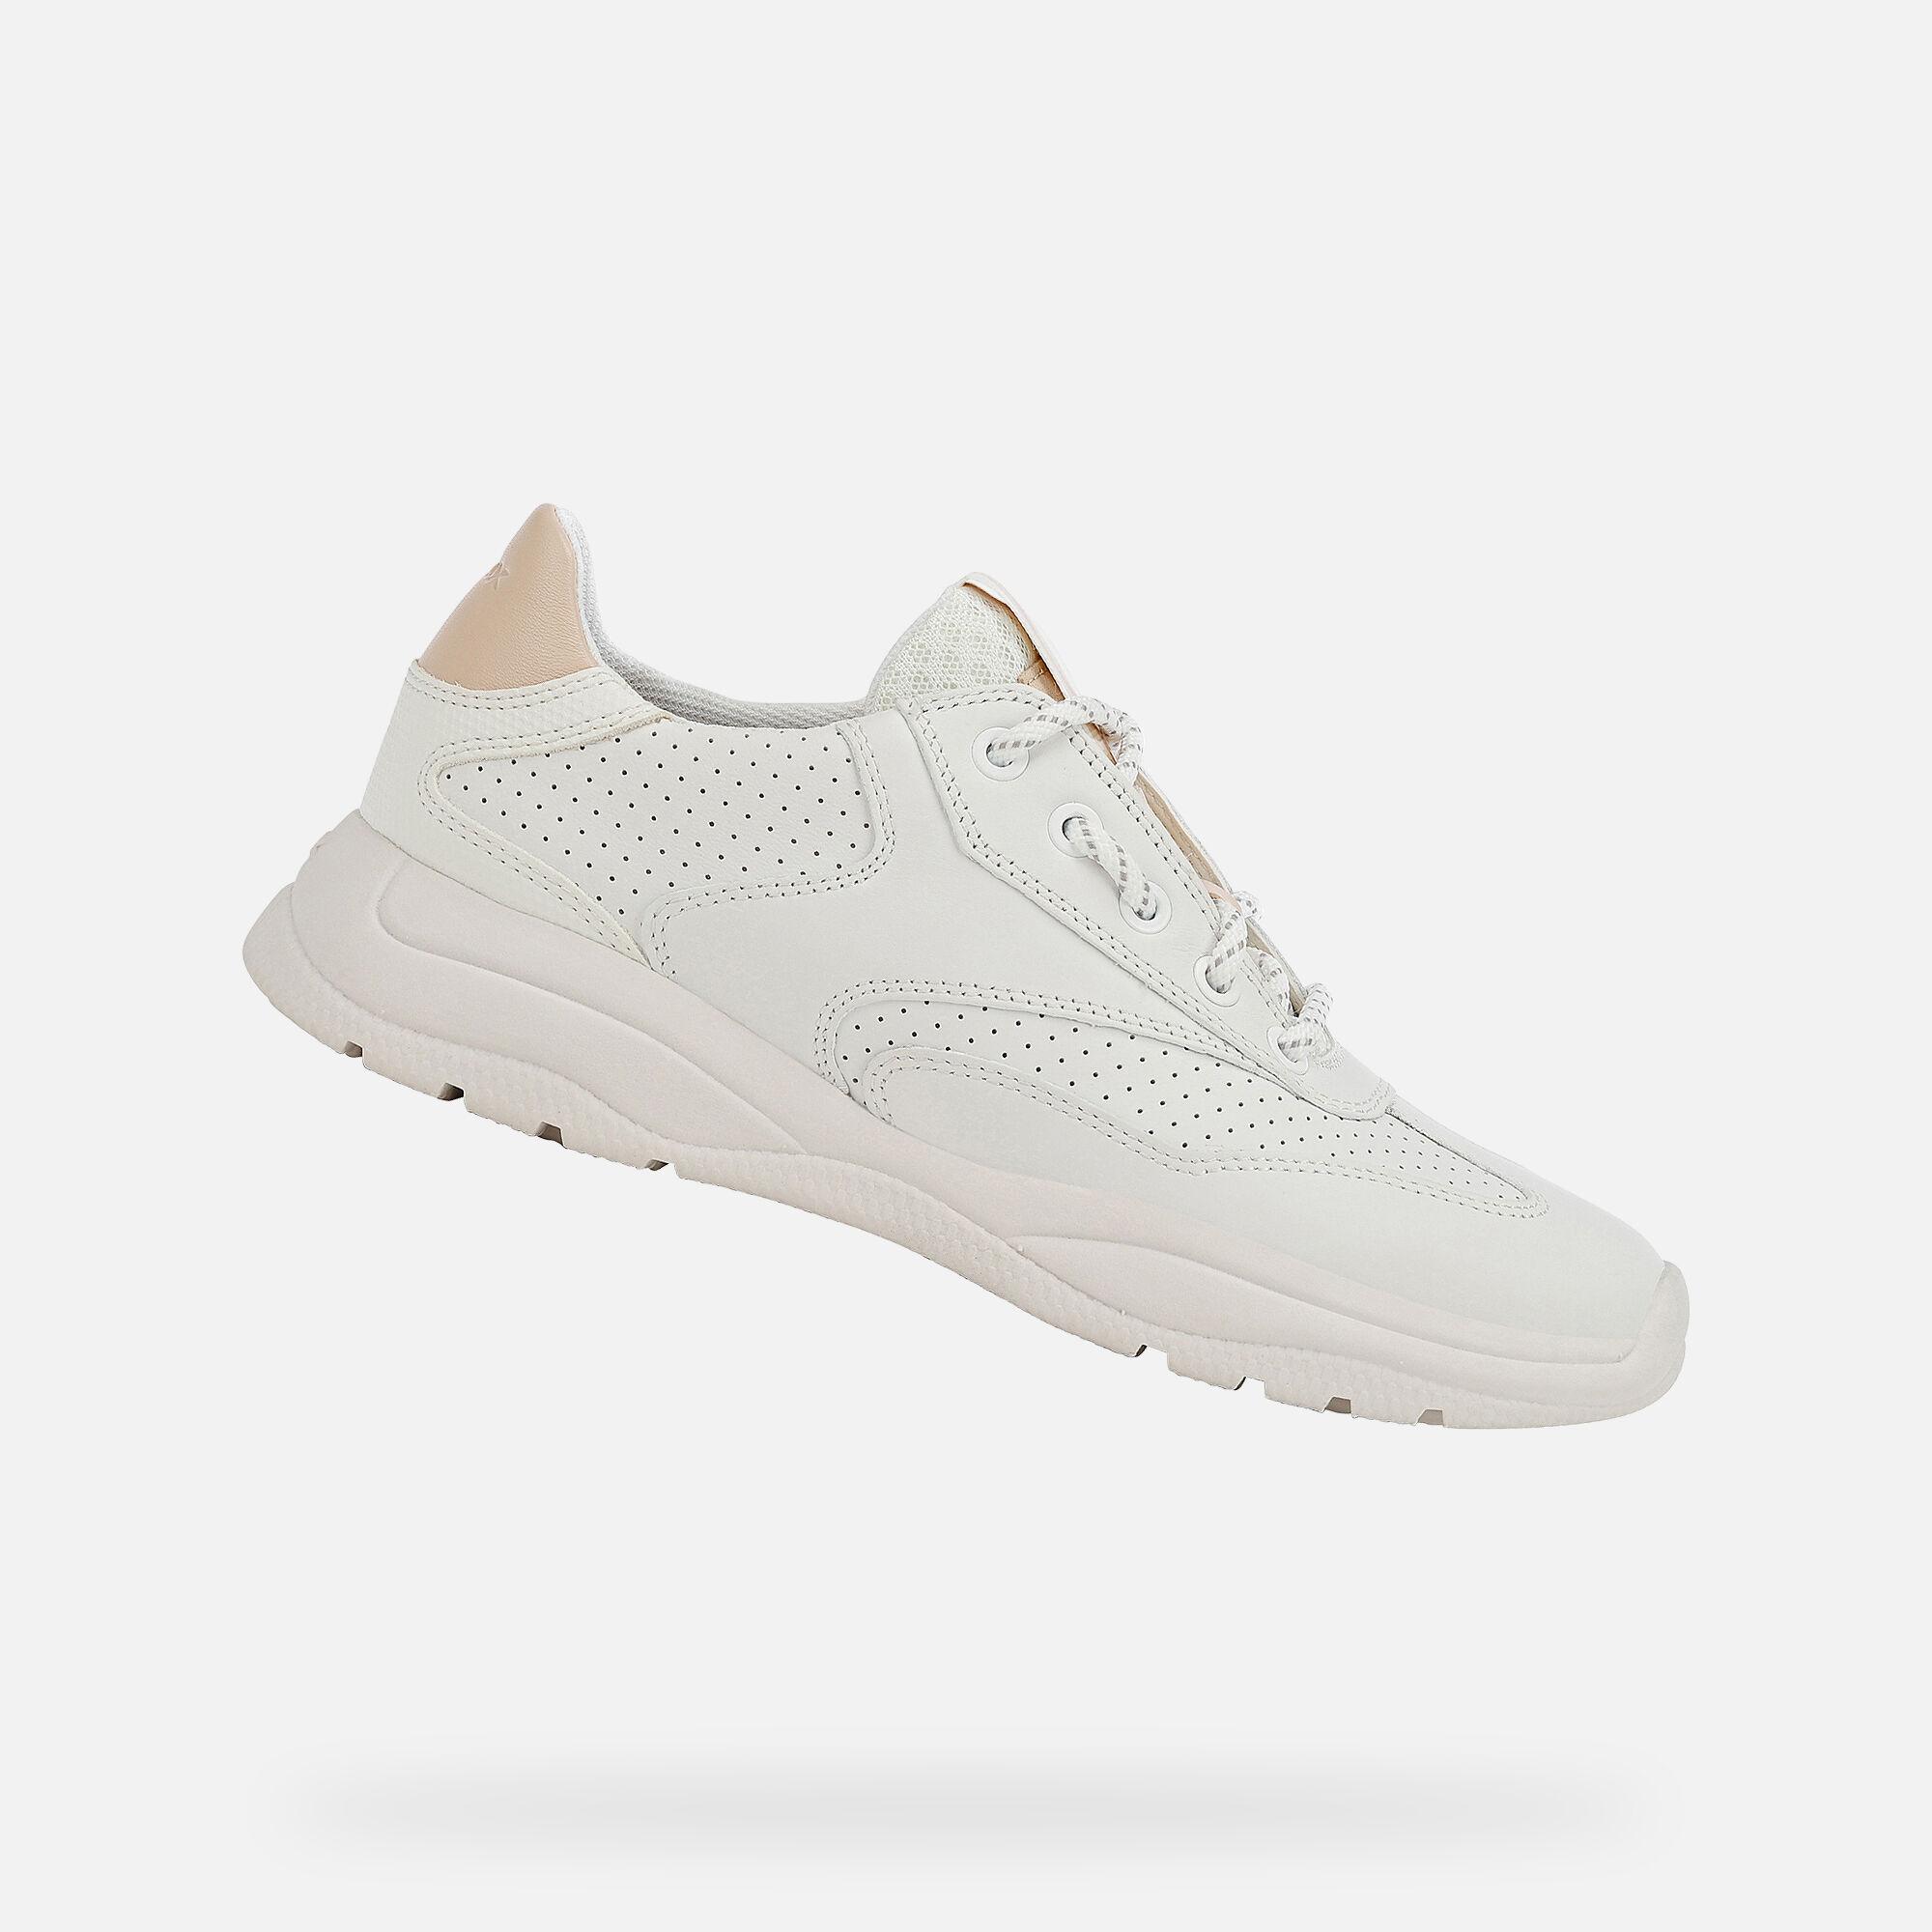 Geox SMERALDO Woman: White Sneakers